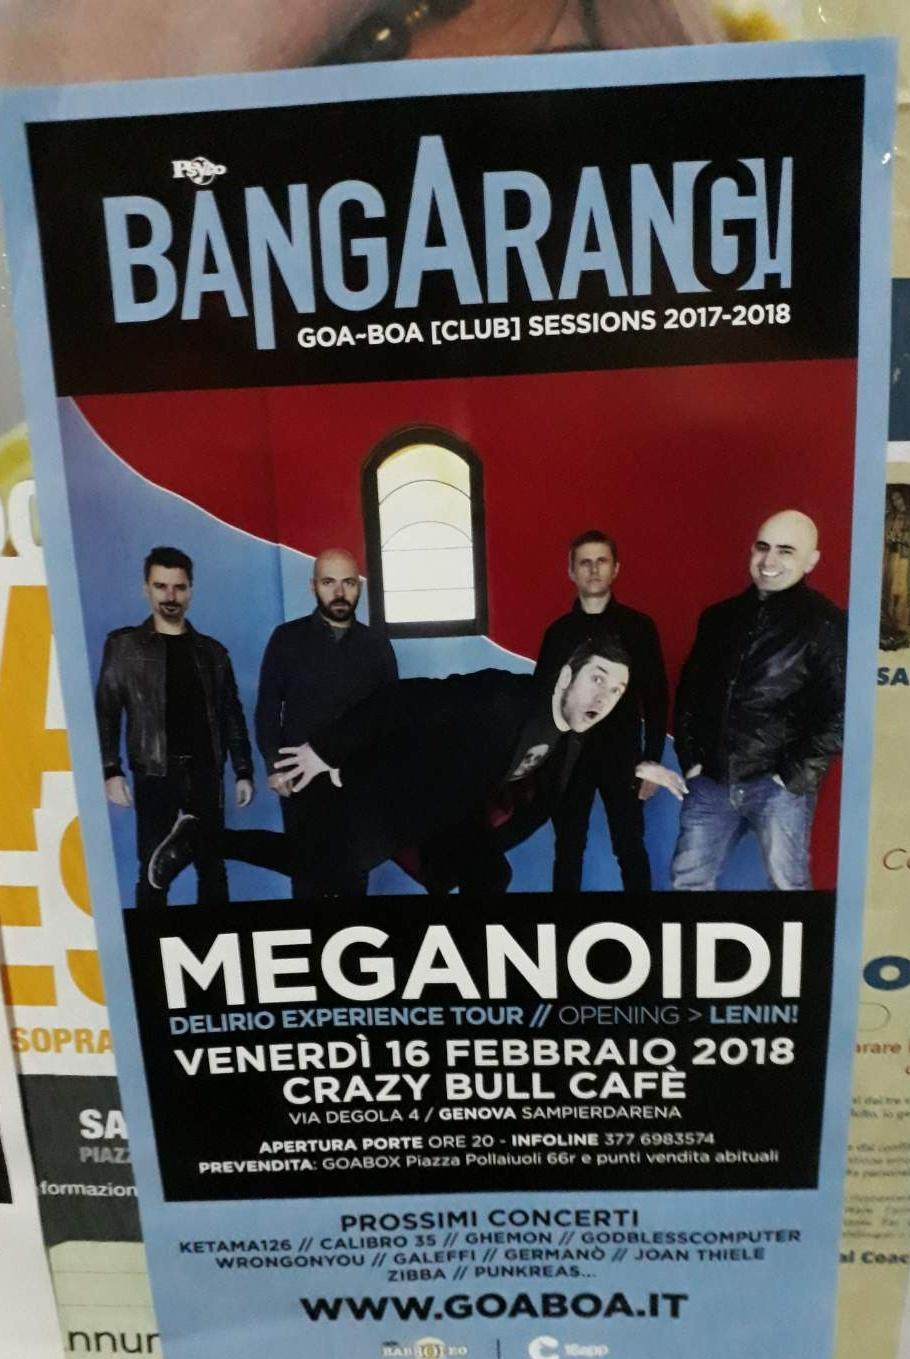 Bangarang - Meganoidi Crazy Bull Café Via Eustachio Degola 4, 16151 Genova Dal 16/02/2018 Al 16/02/2018 20:00 - 00:00